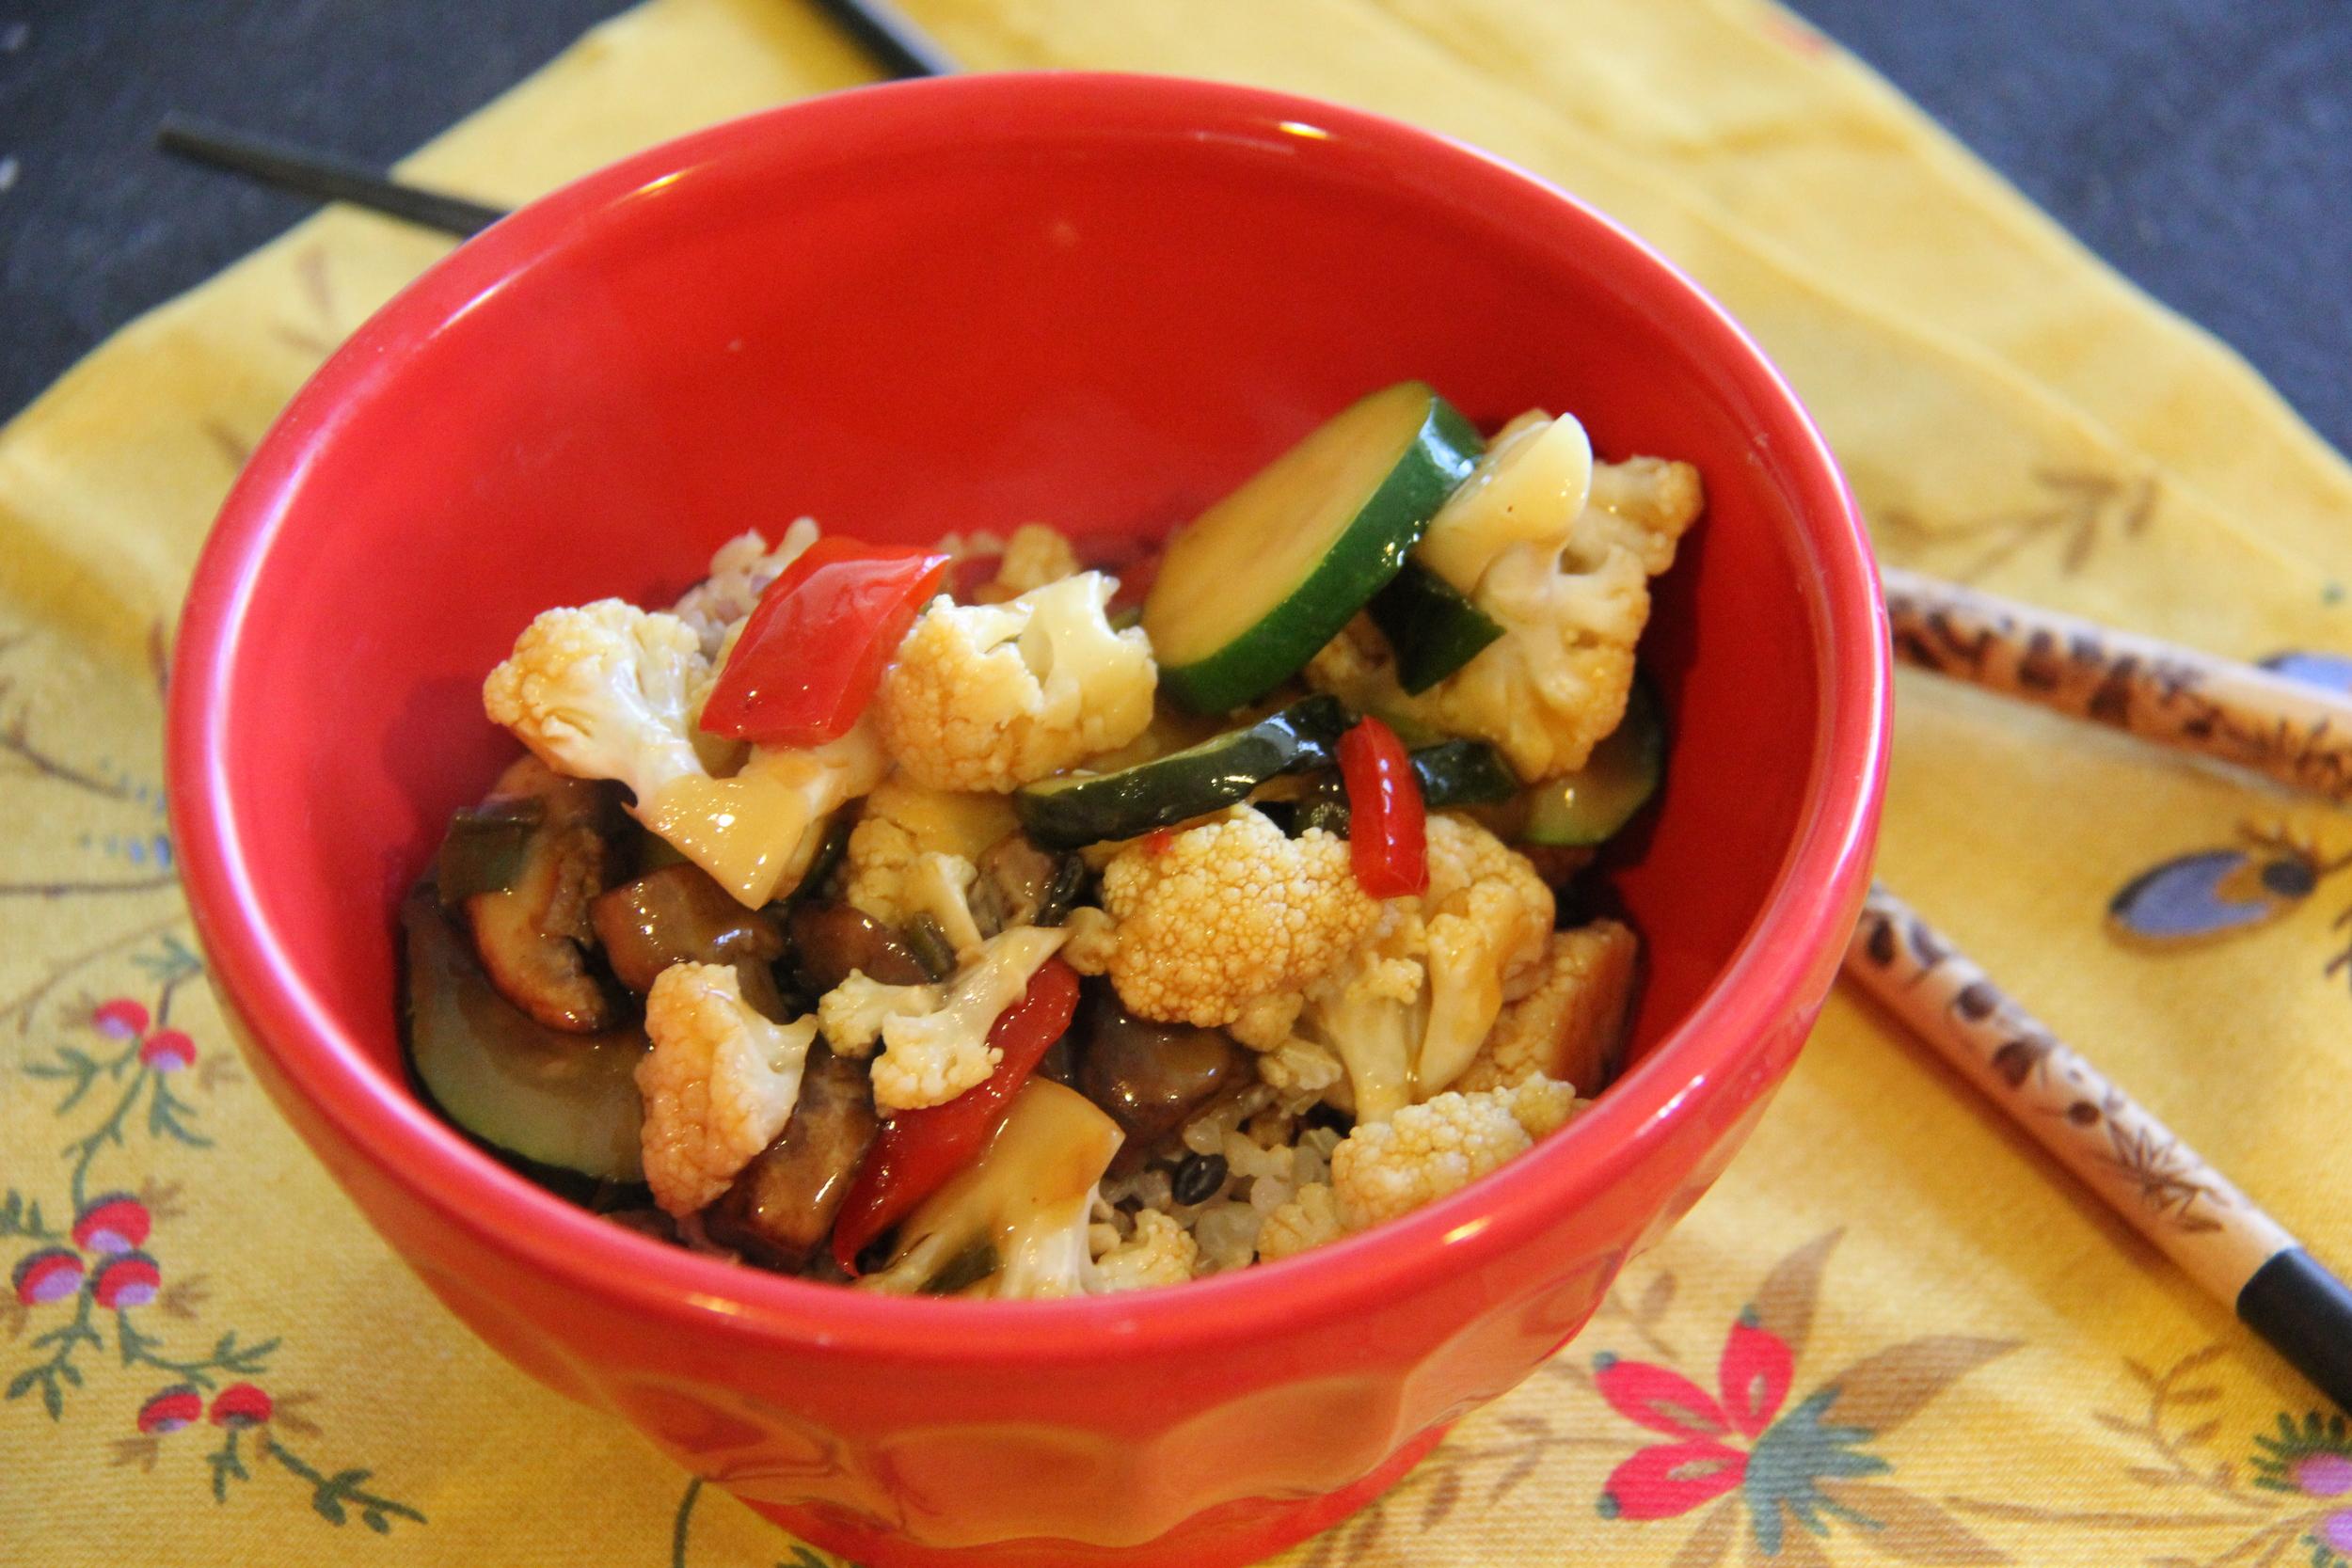 Veggie Stir-Fry Over Rice